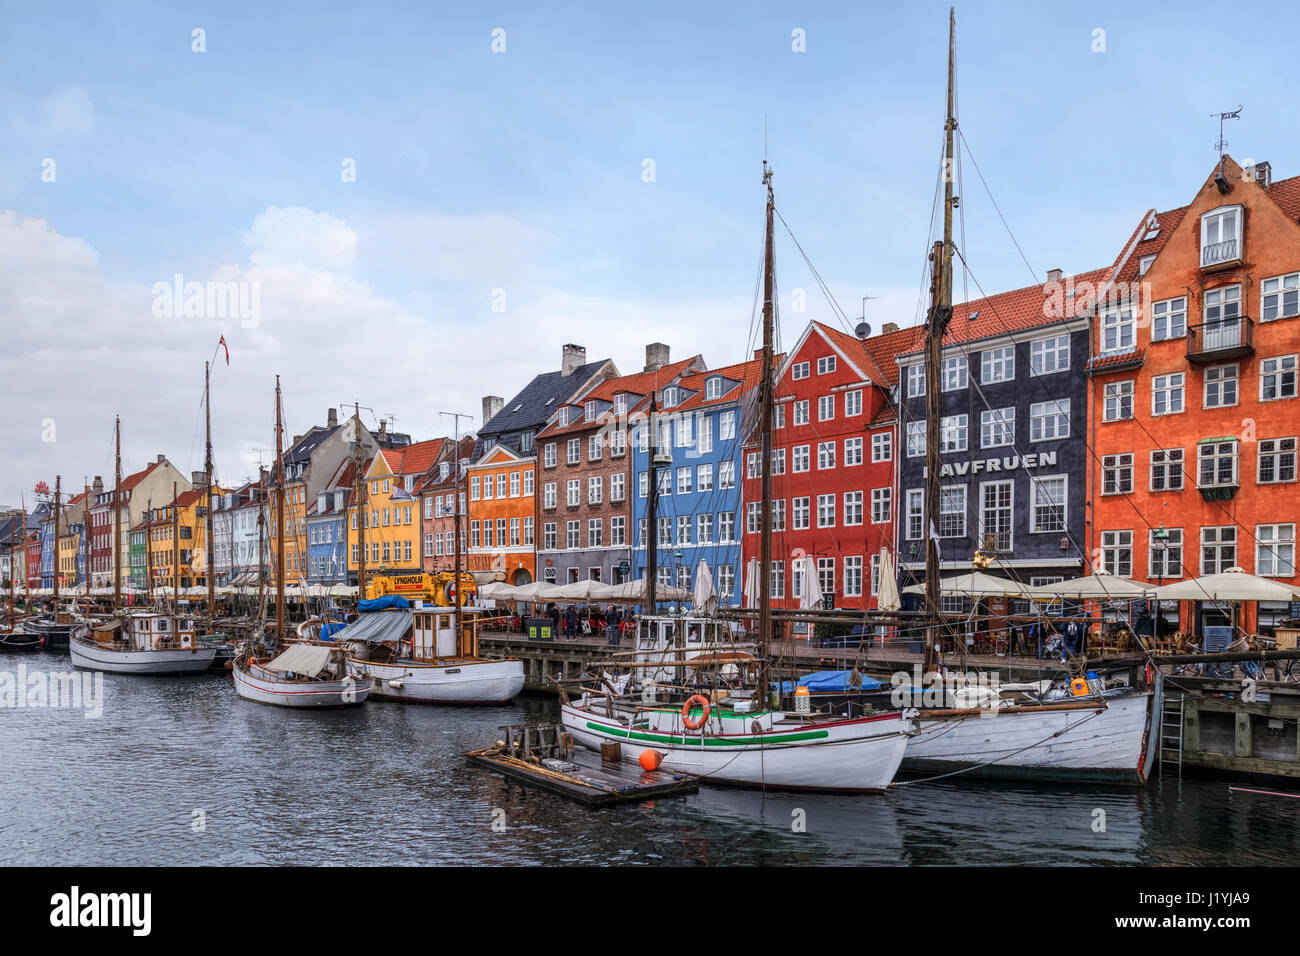 Nyhavn, Copenhague, Dinamarca, Escandinavia Foto de stock